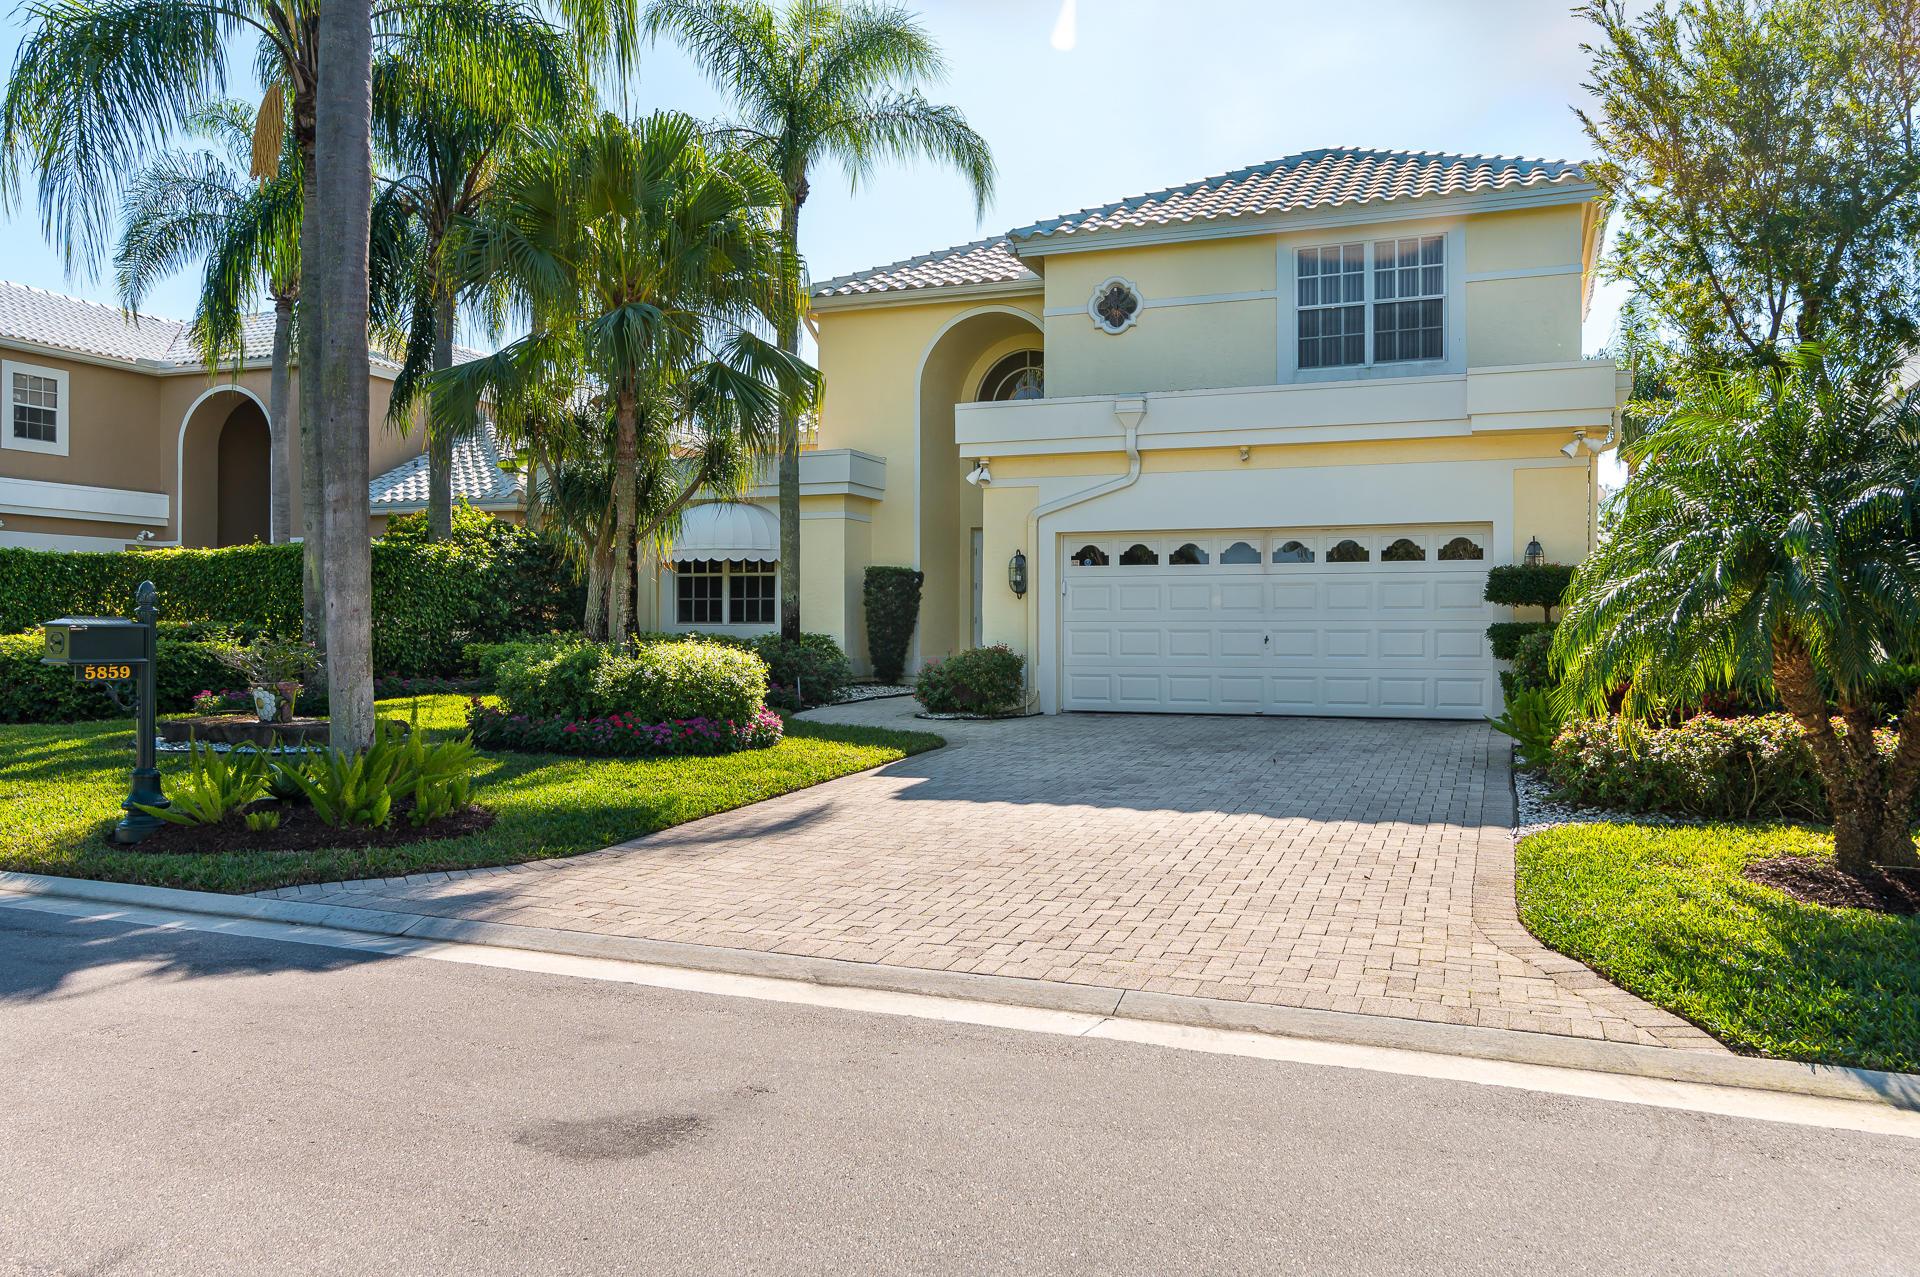 5859 Waterford  Boca Raton FL 33496